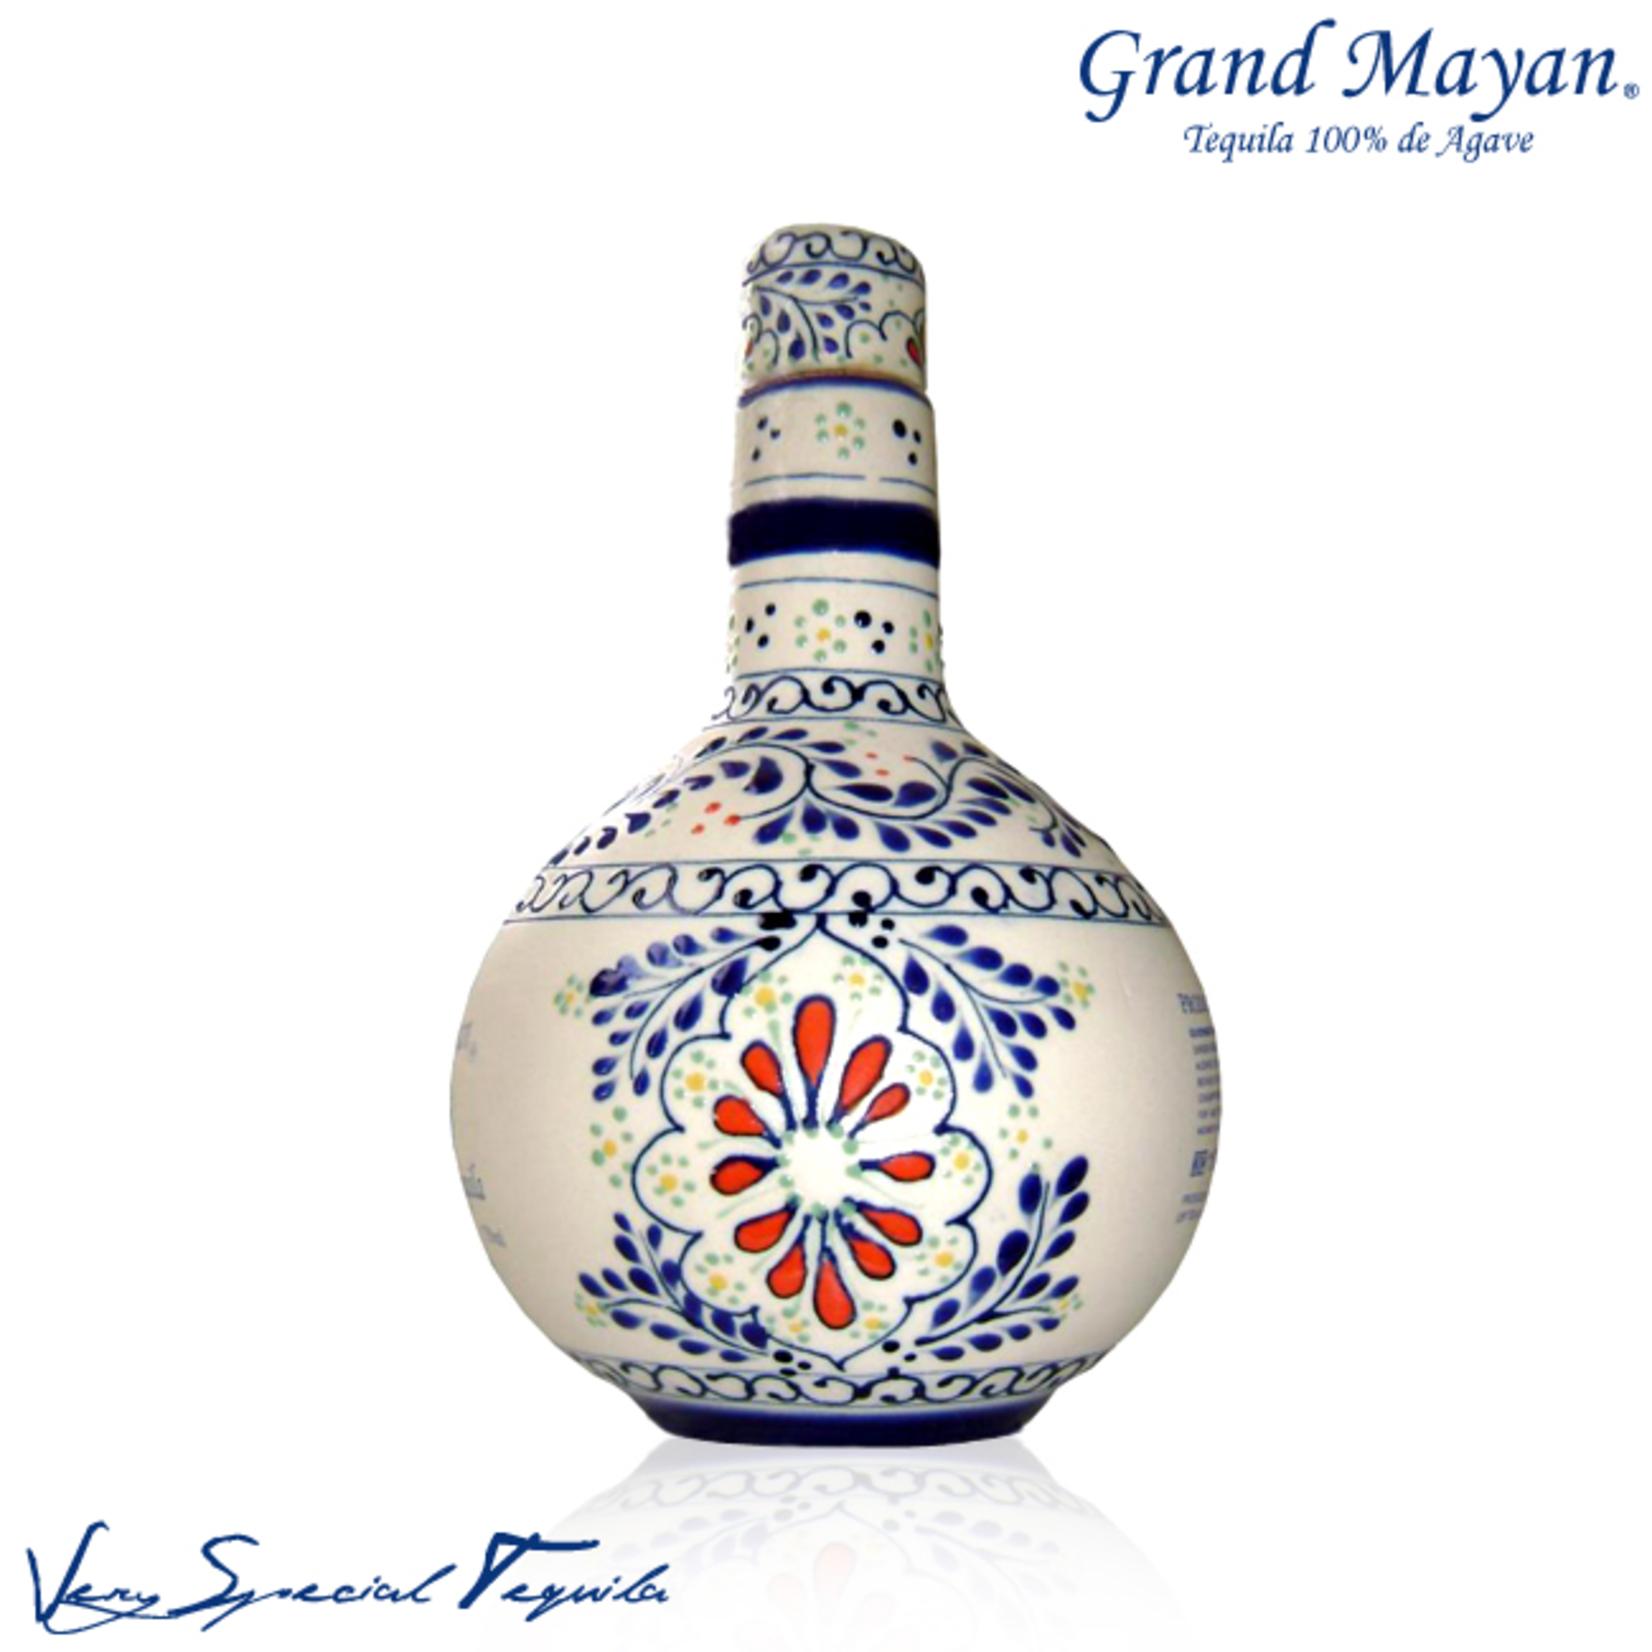 Spirits Grand Mayan Tequila Extra Anejo